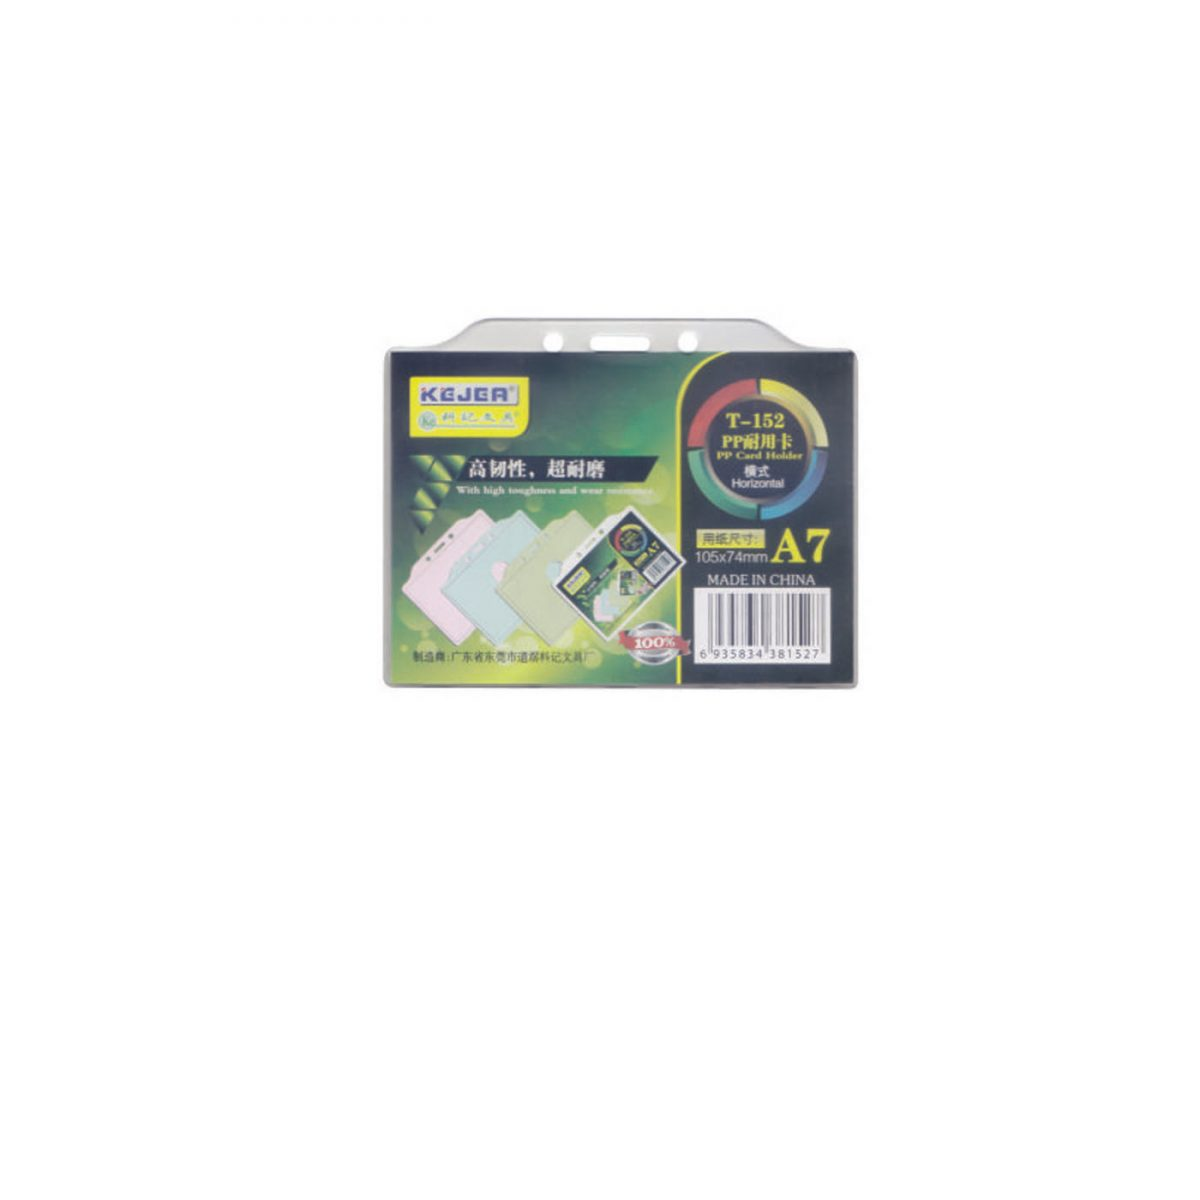 Suport carduri orizontal, 105x74 mm KEJEA T-152H, 10 buc/set